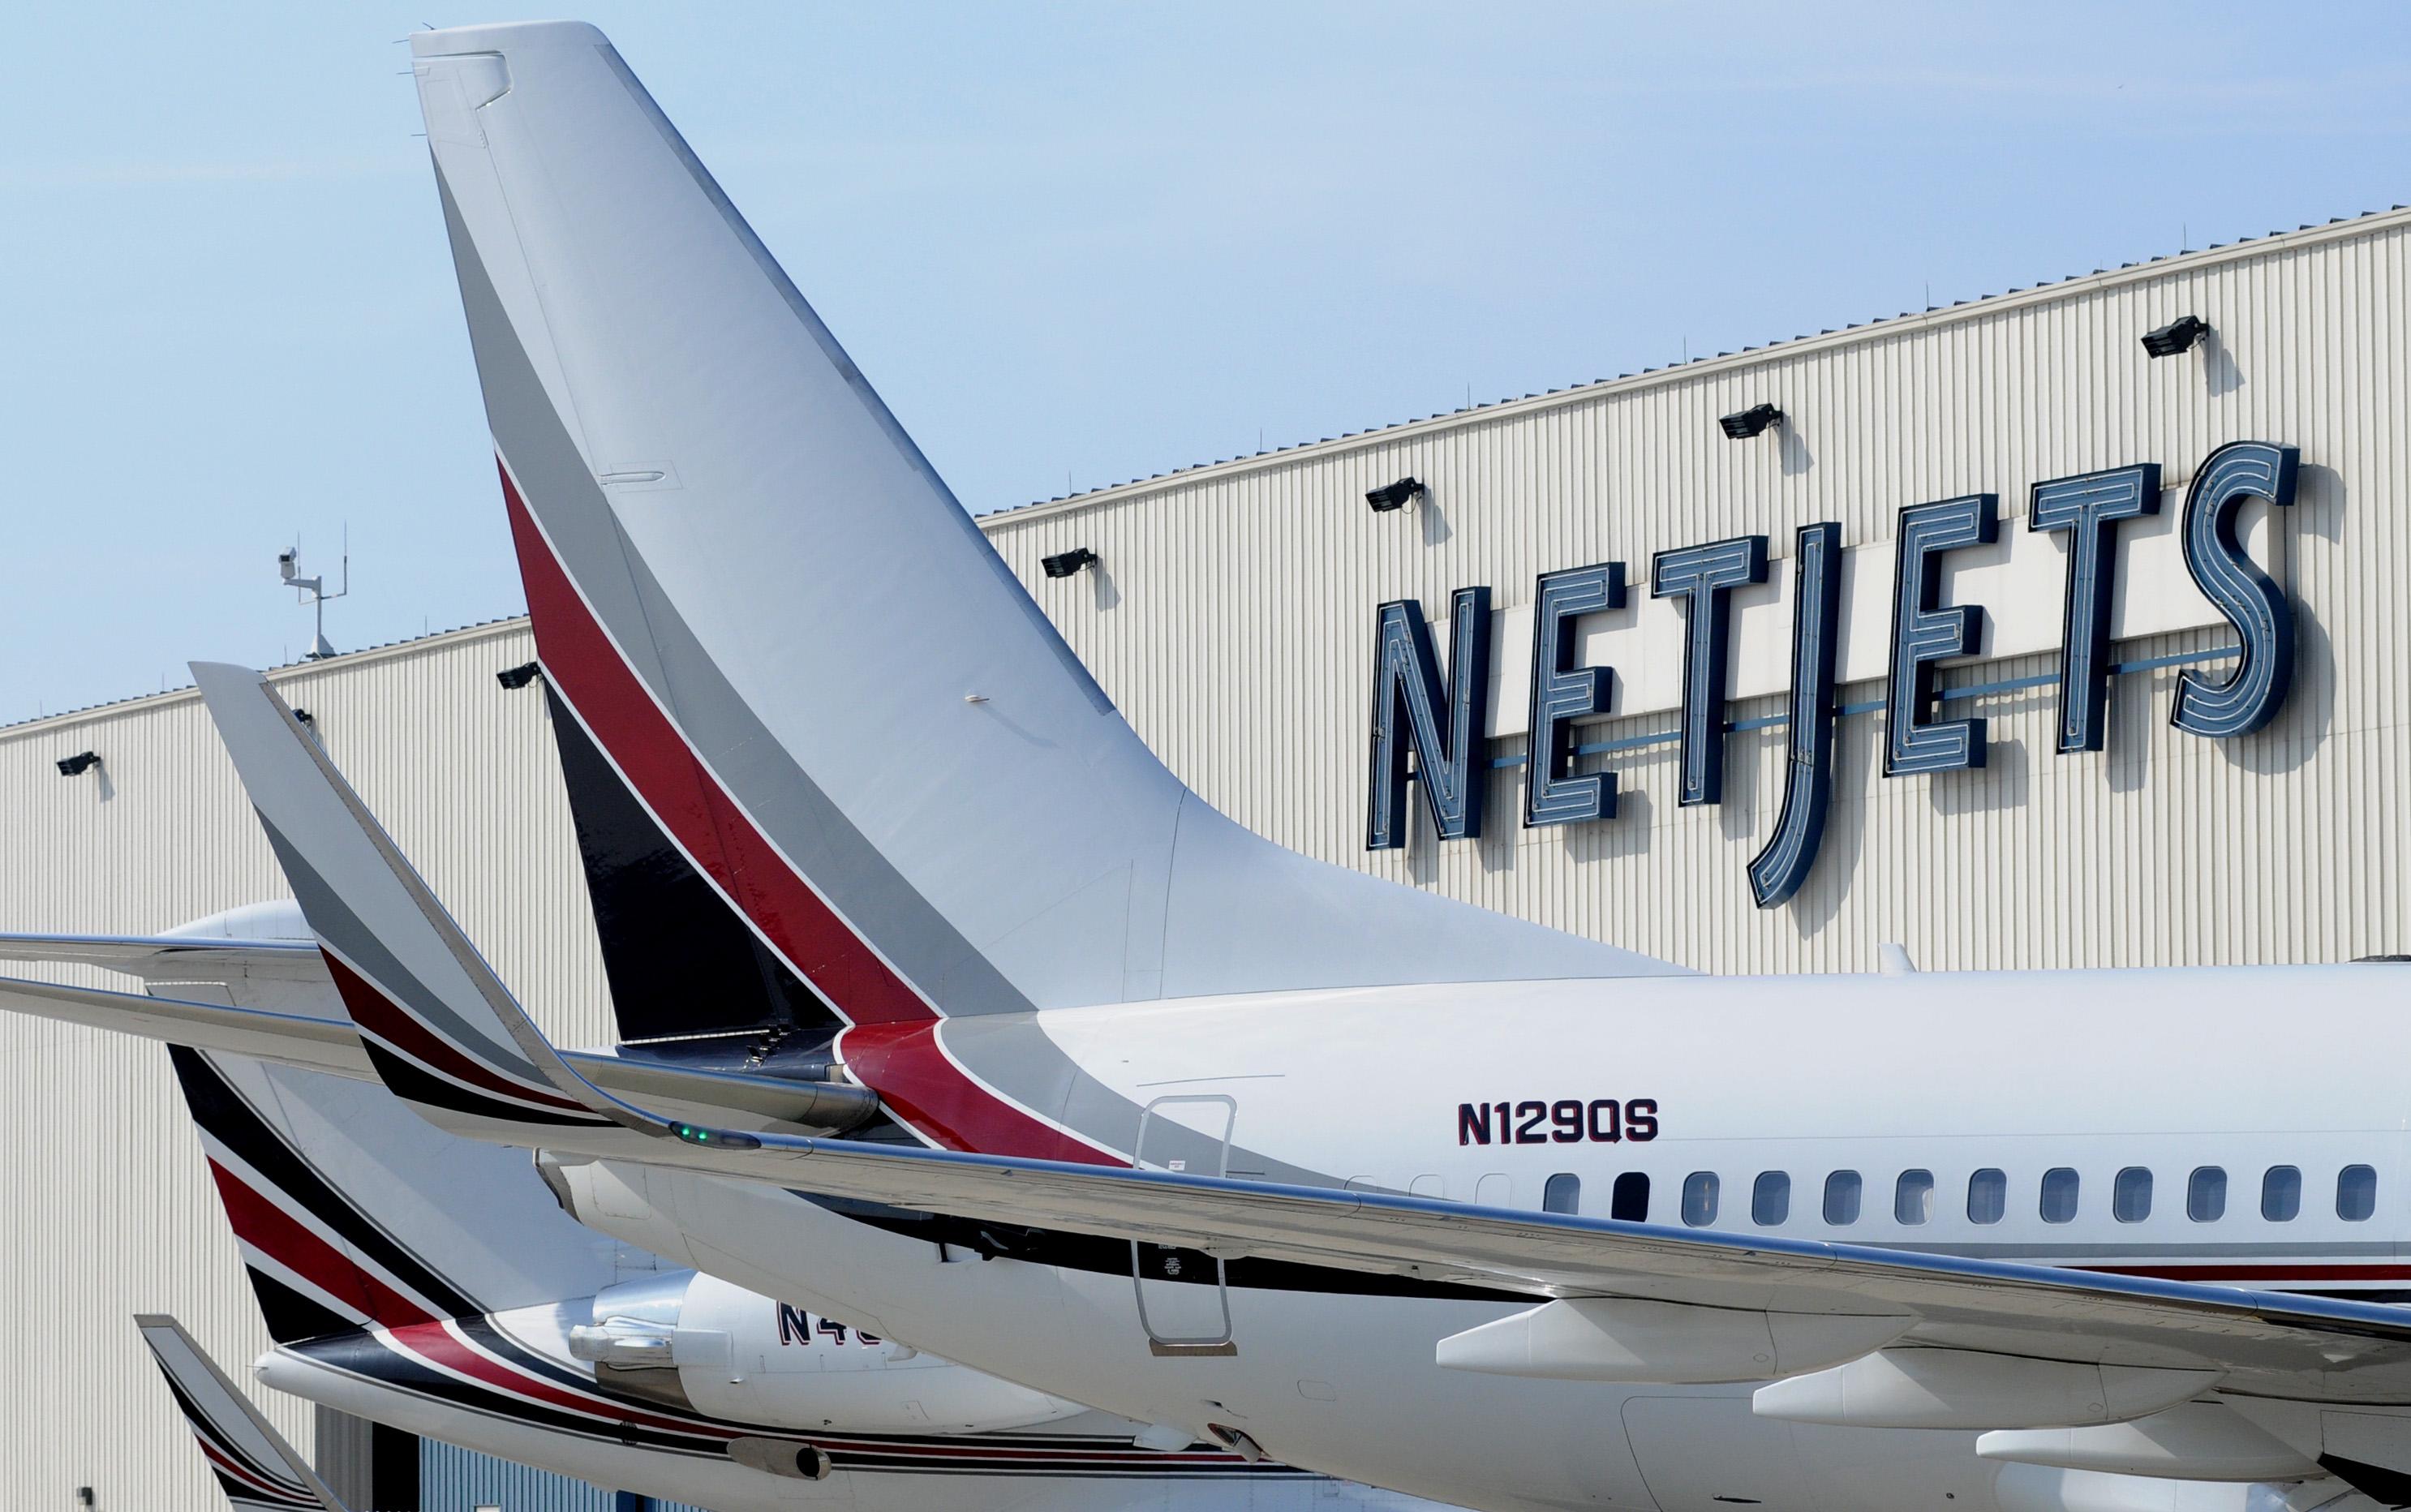 Westchester Airport - Net Jets